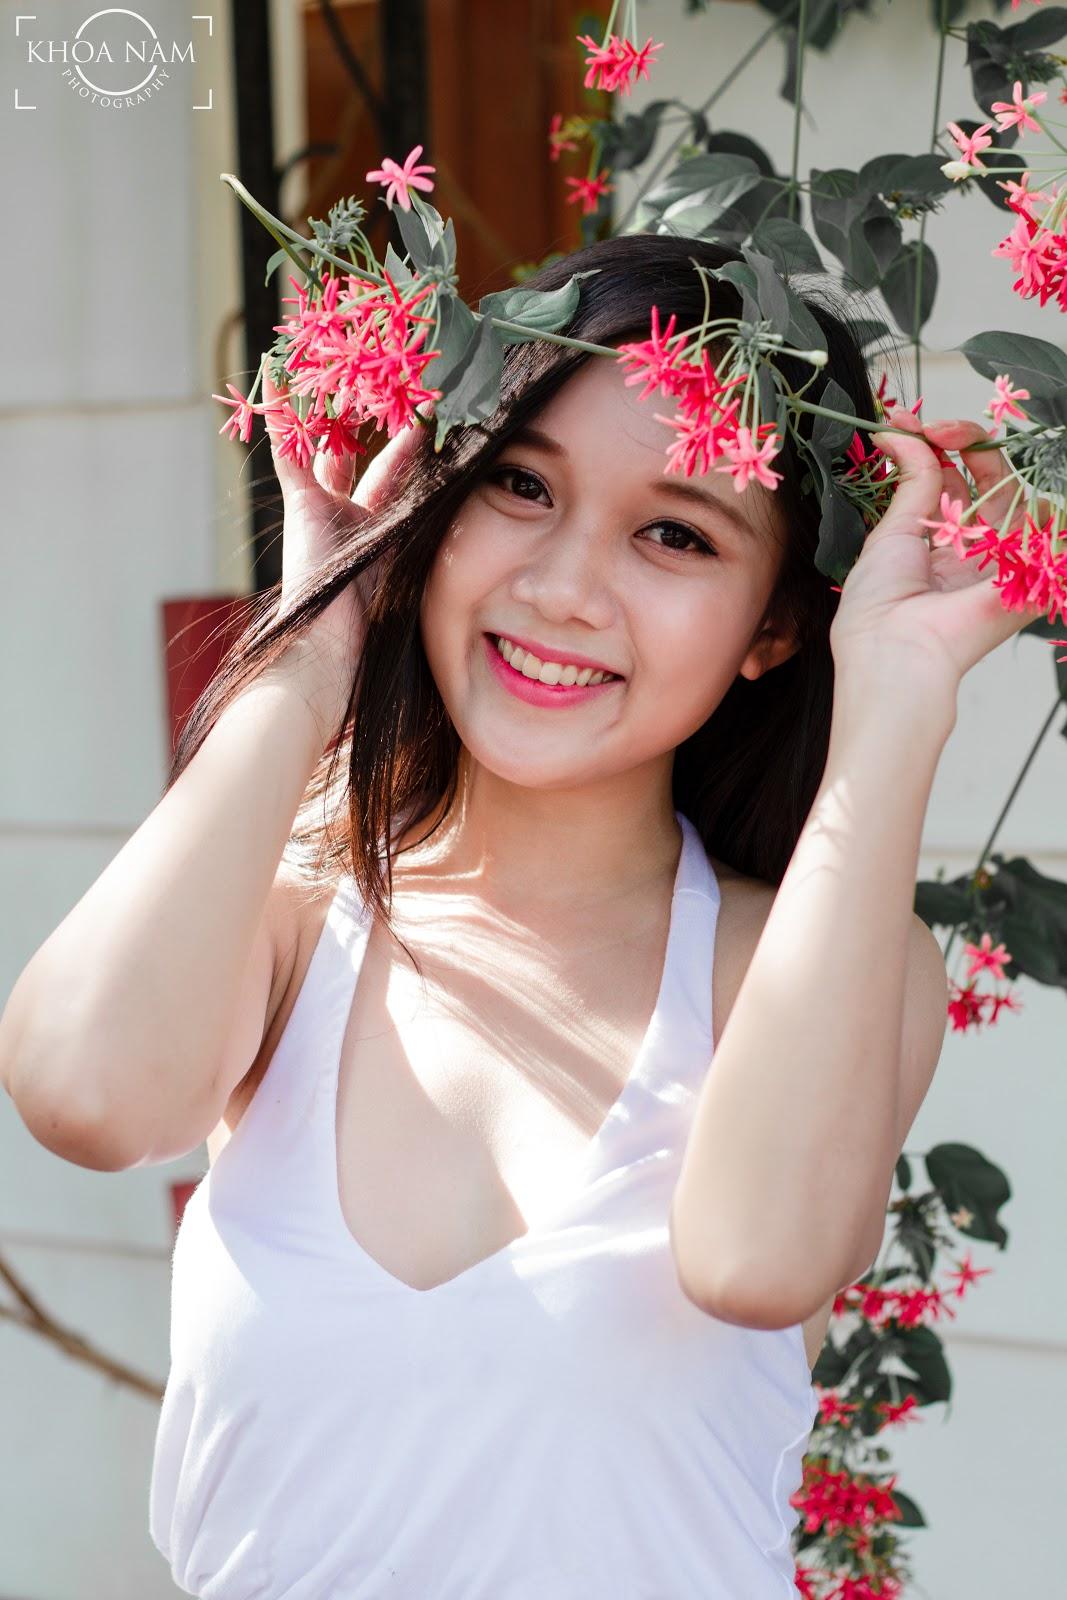 Vietnamese Beauty Girls by Khoa Nam Part 5 (75 pics)